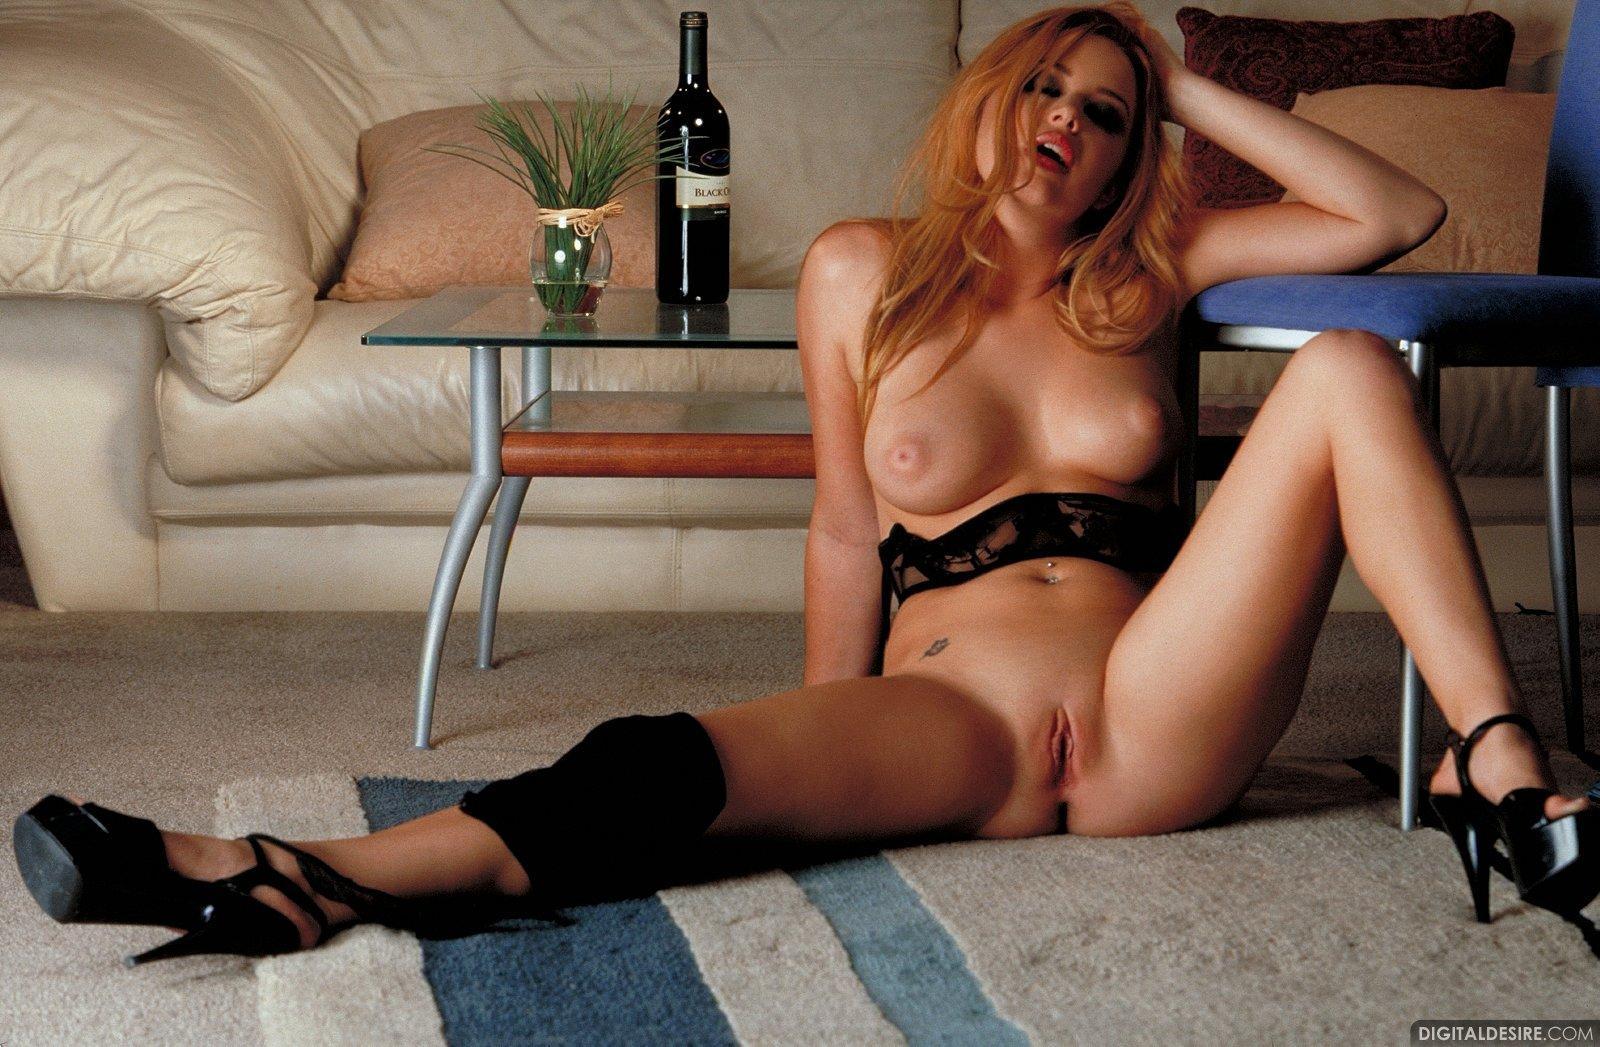 Pornstar Holly Morgan Top holly morgan in sexy lingerie and heels posing and spreading her